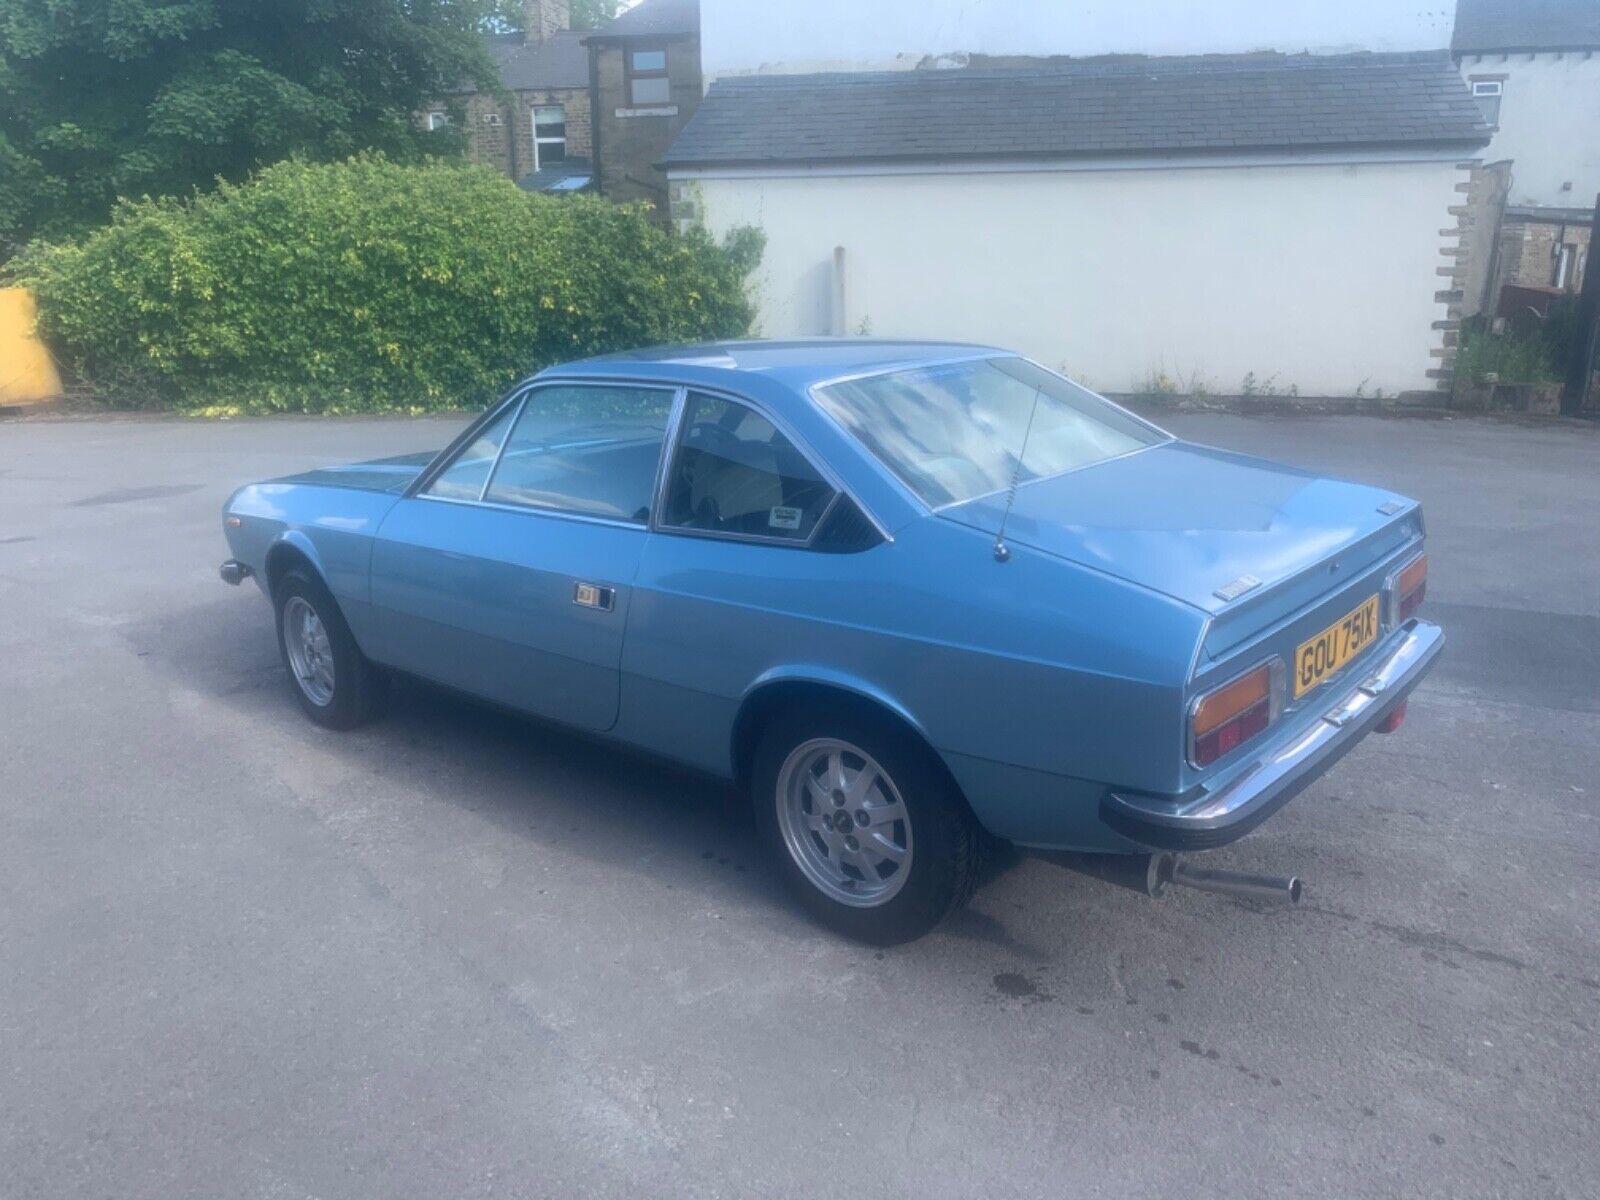 Lancia-Beta-Coupe-barn-find-classic-car